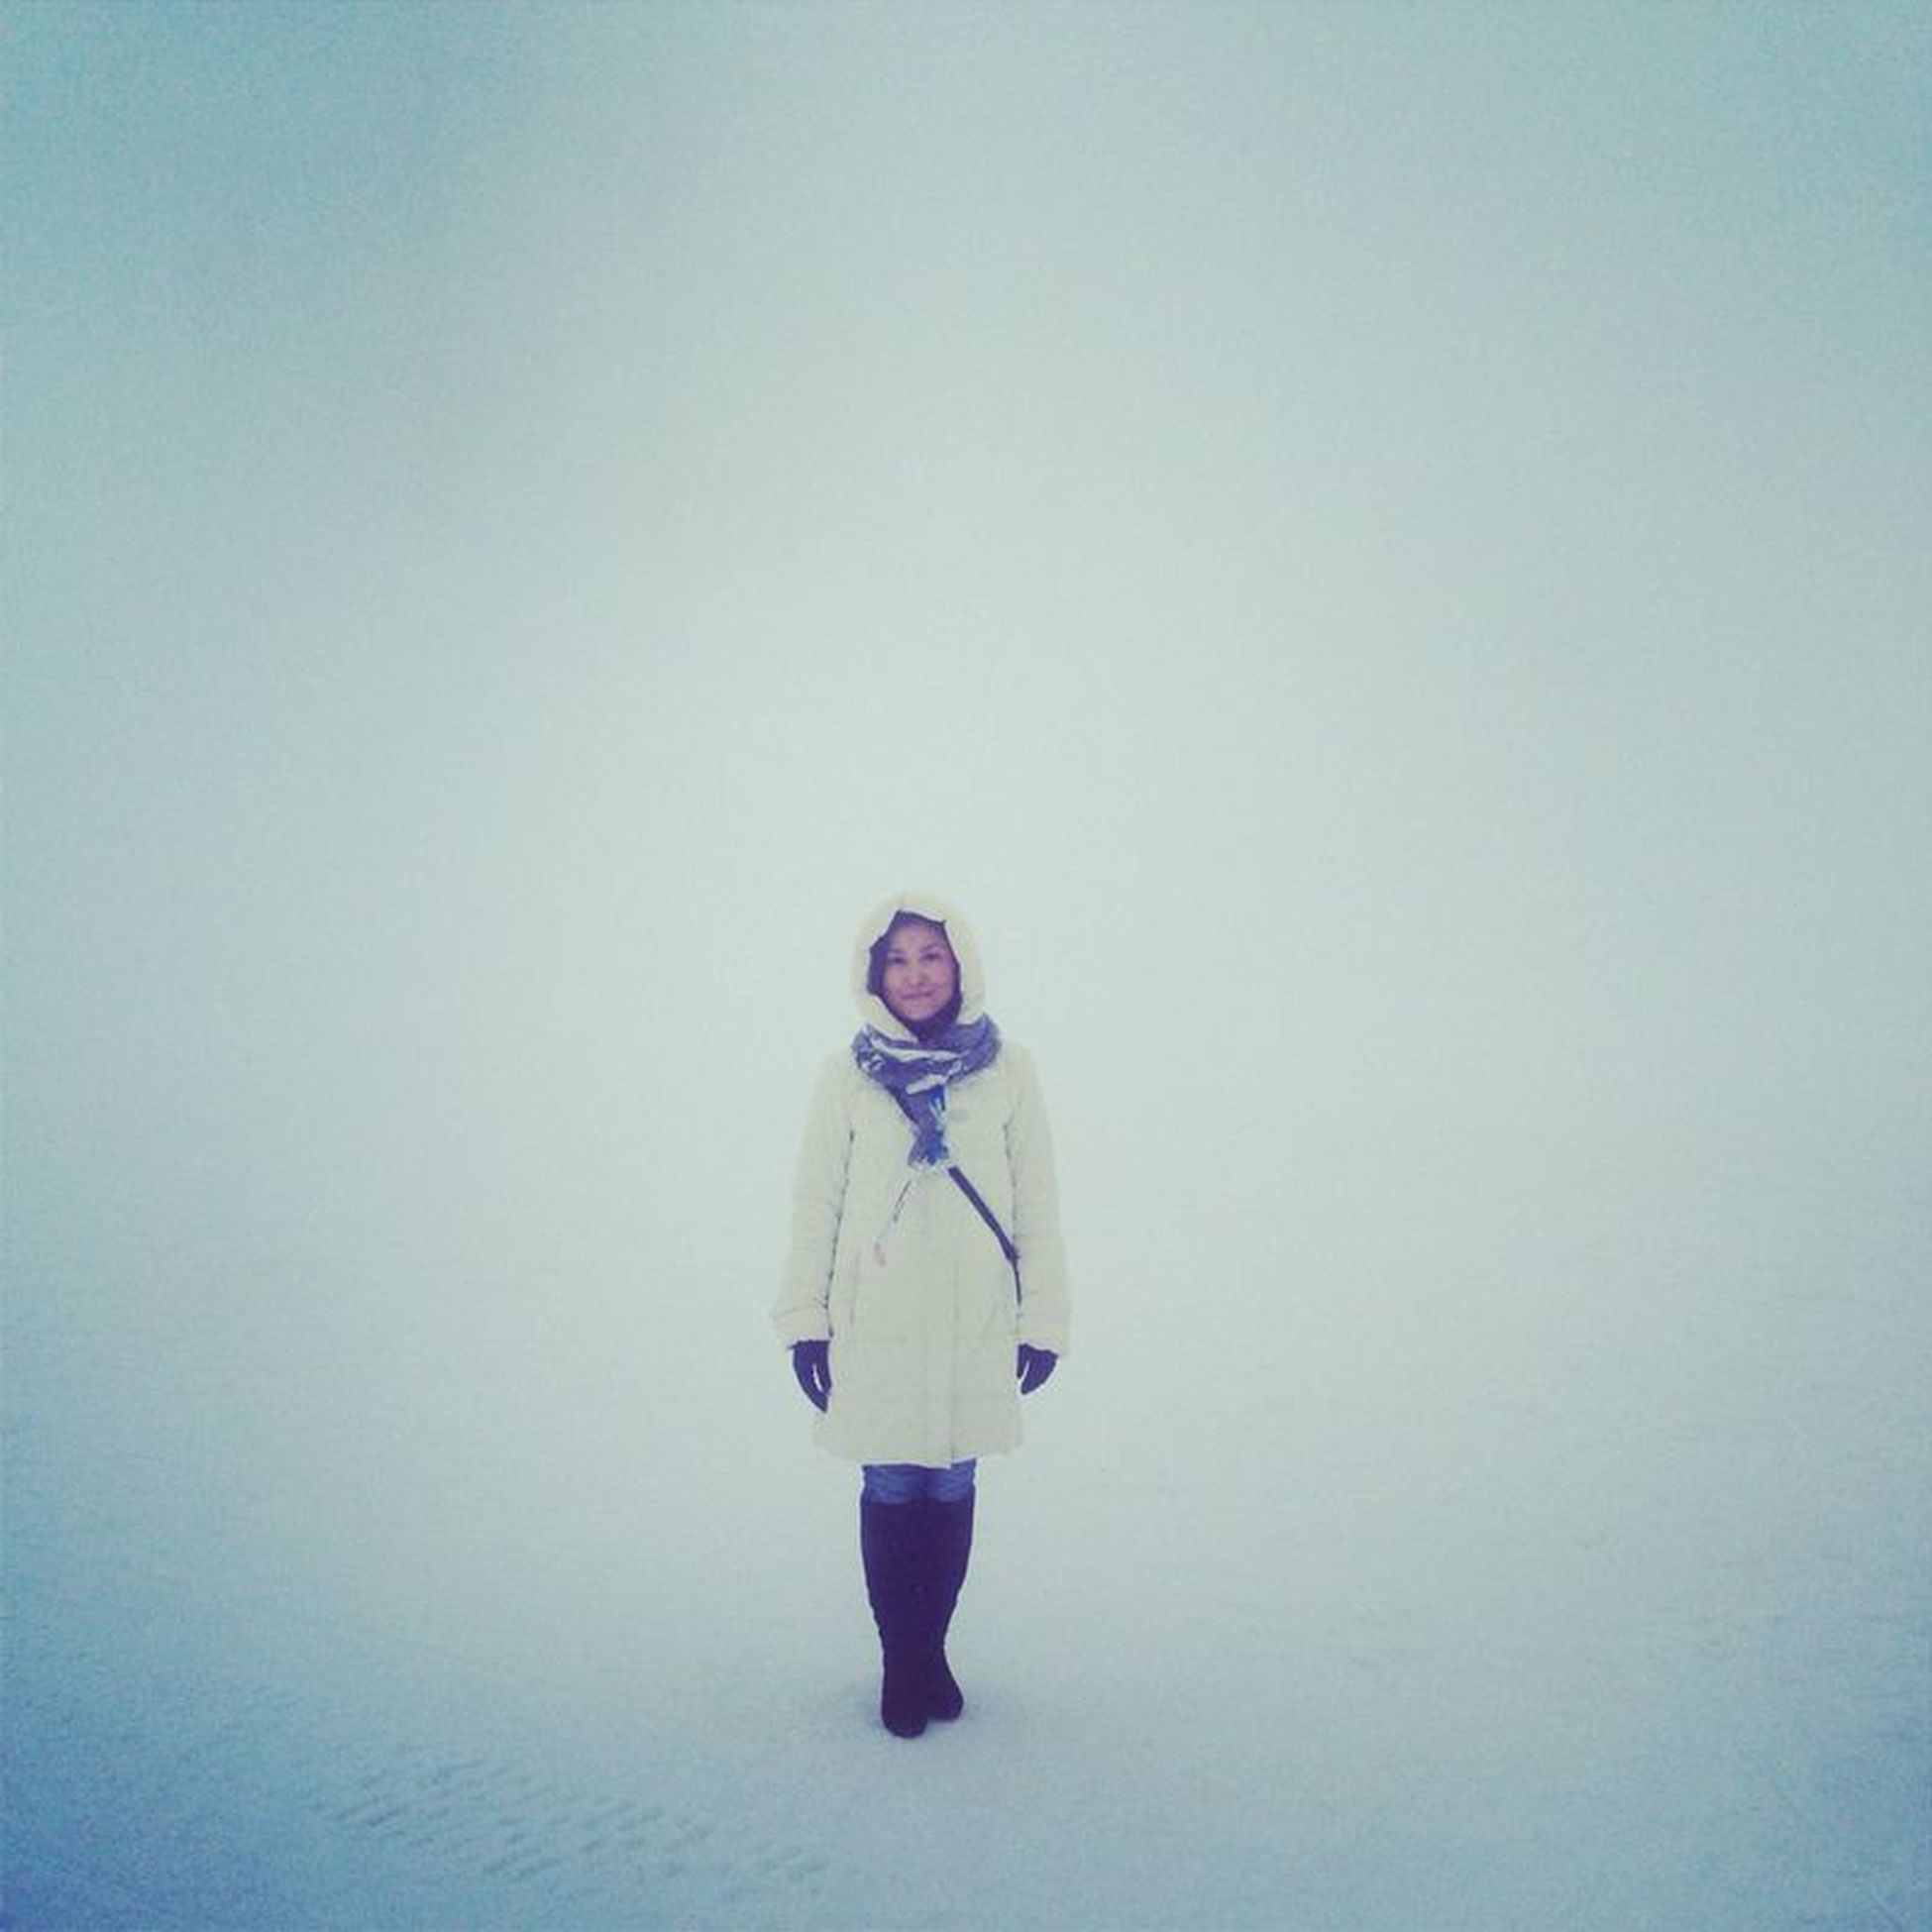 туман Сочи Роза хутор Itmists Sochi Sochi2014 Rosakhutor